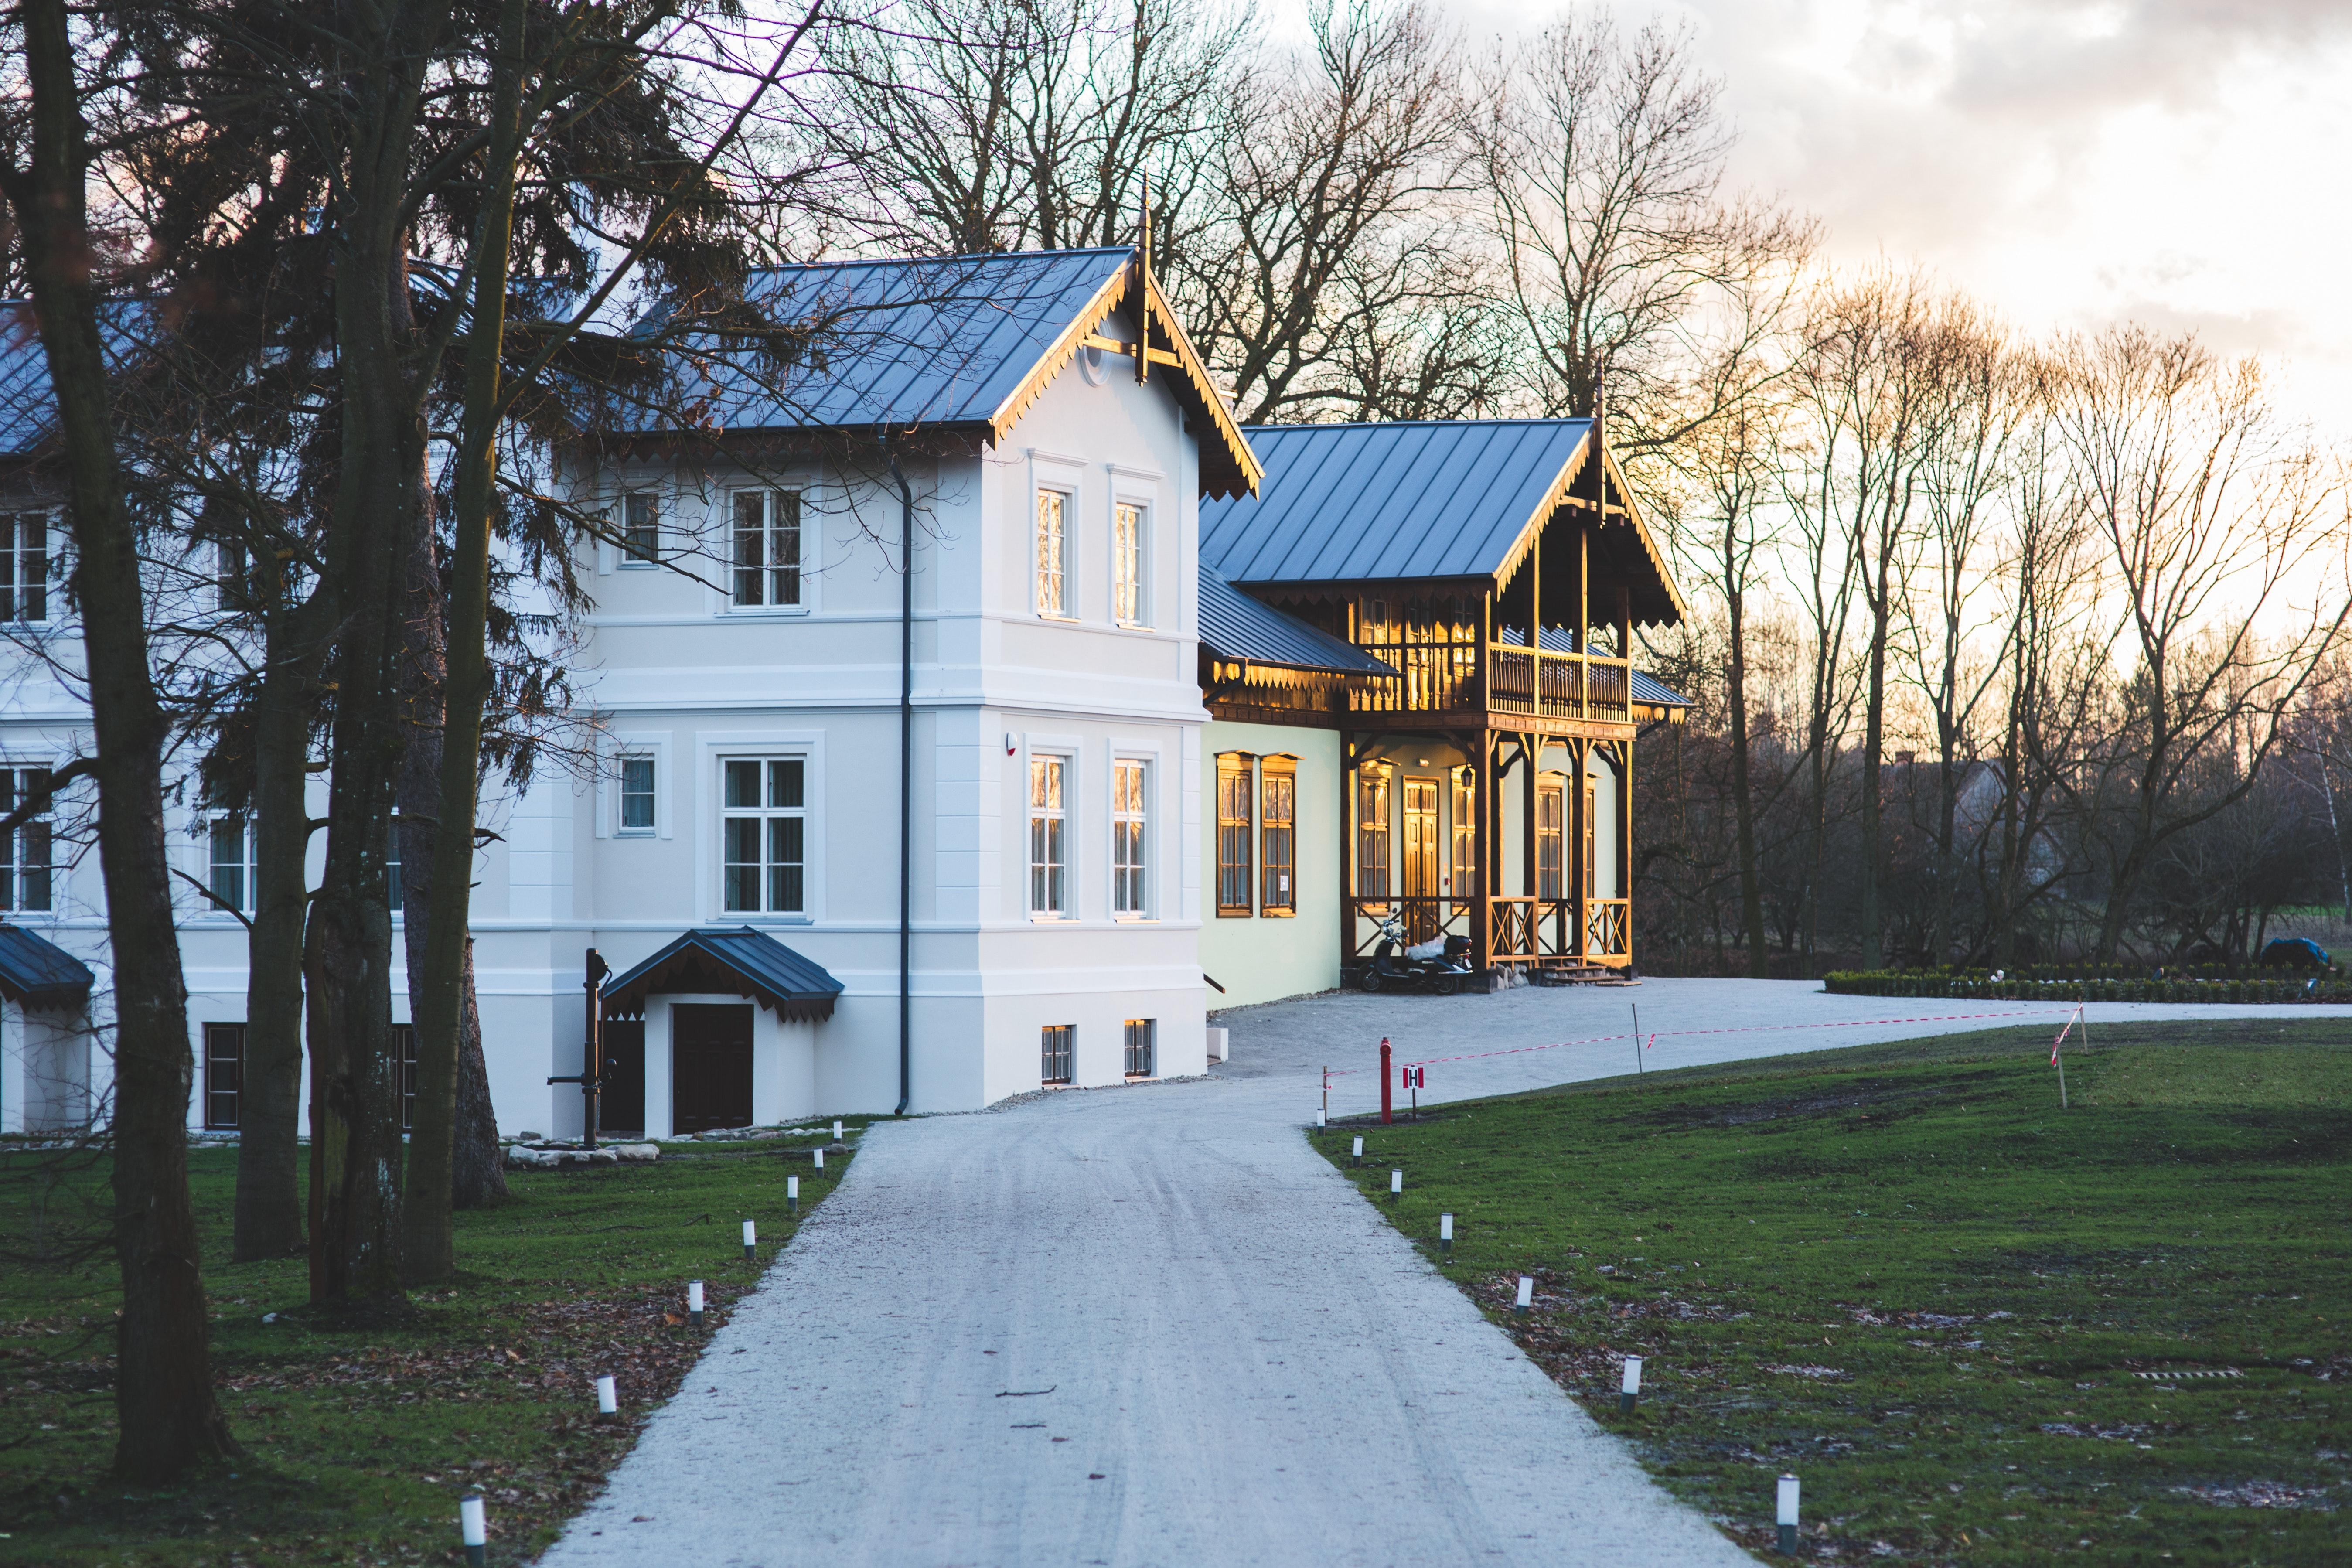 Old luxury villa exterior, Architecture, Plants, Wooden, Wood, HQ Photo